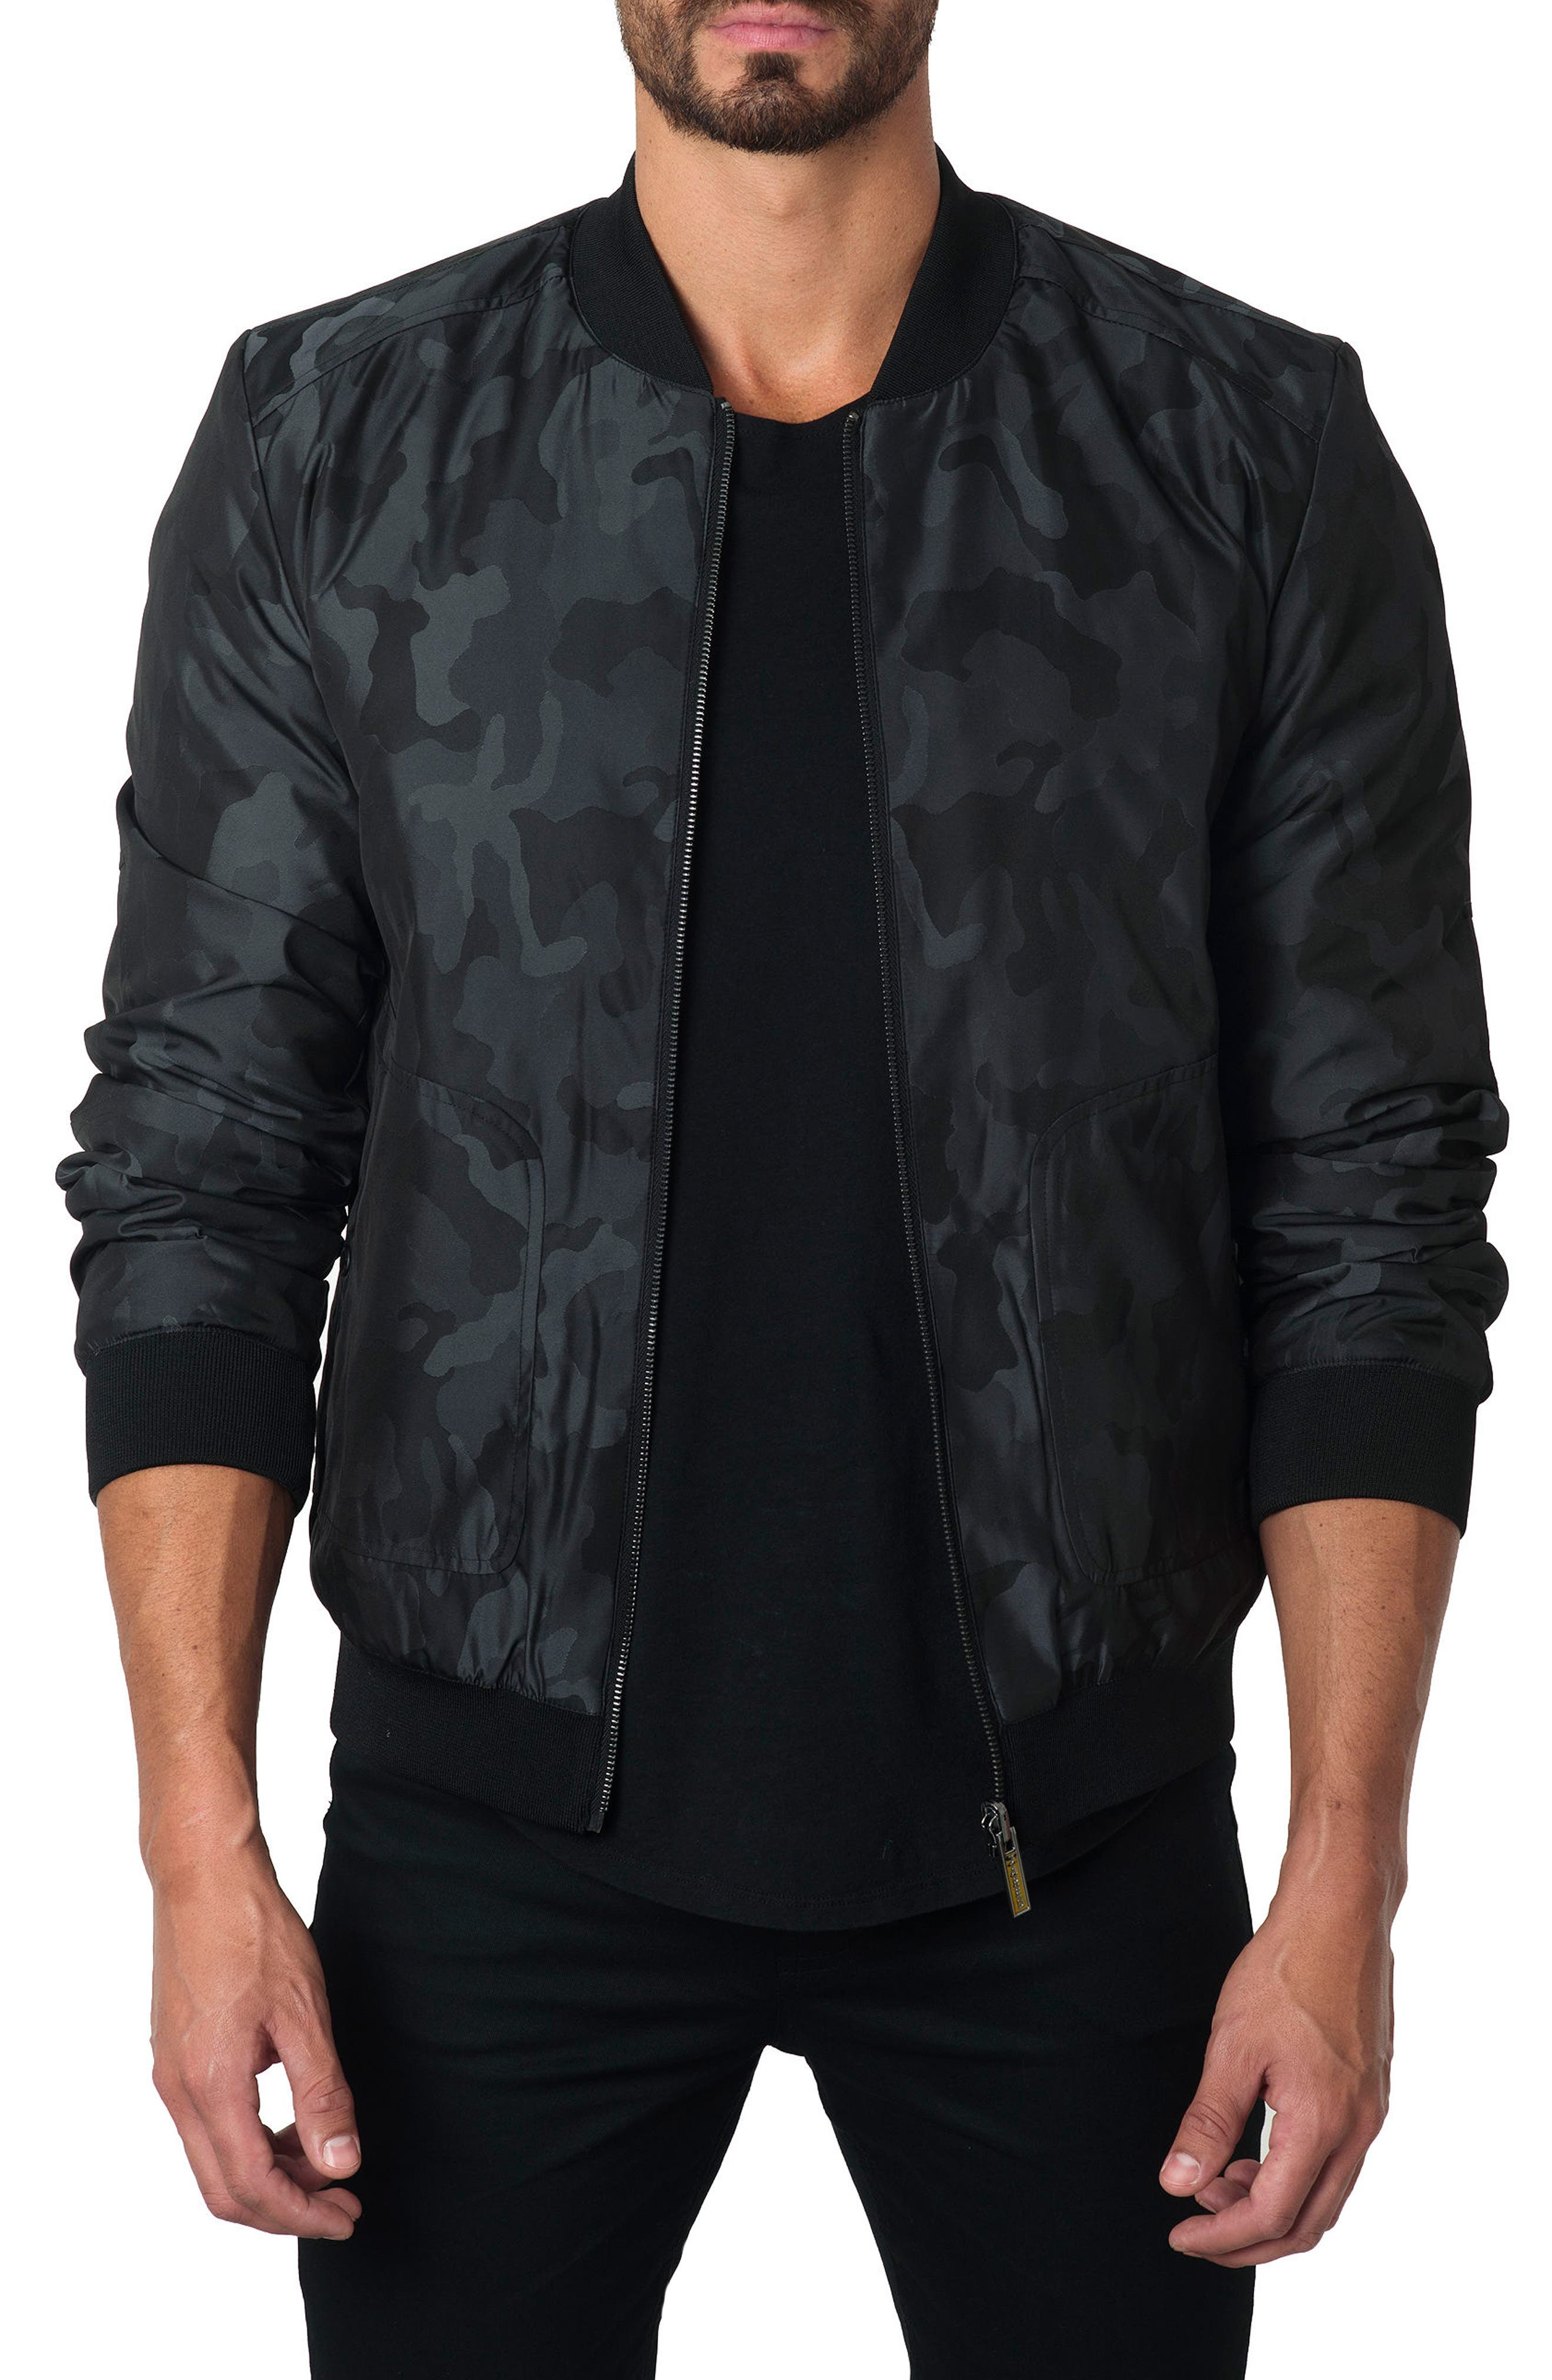 New York Reversible Bomber Jacket,                         Main,                         color, Black Camo